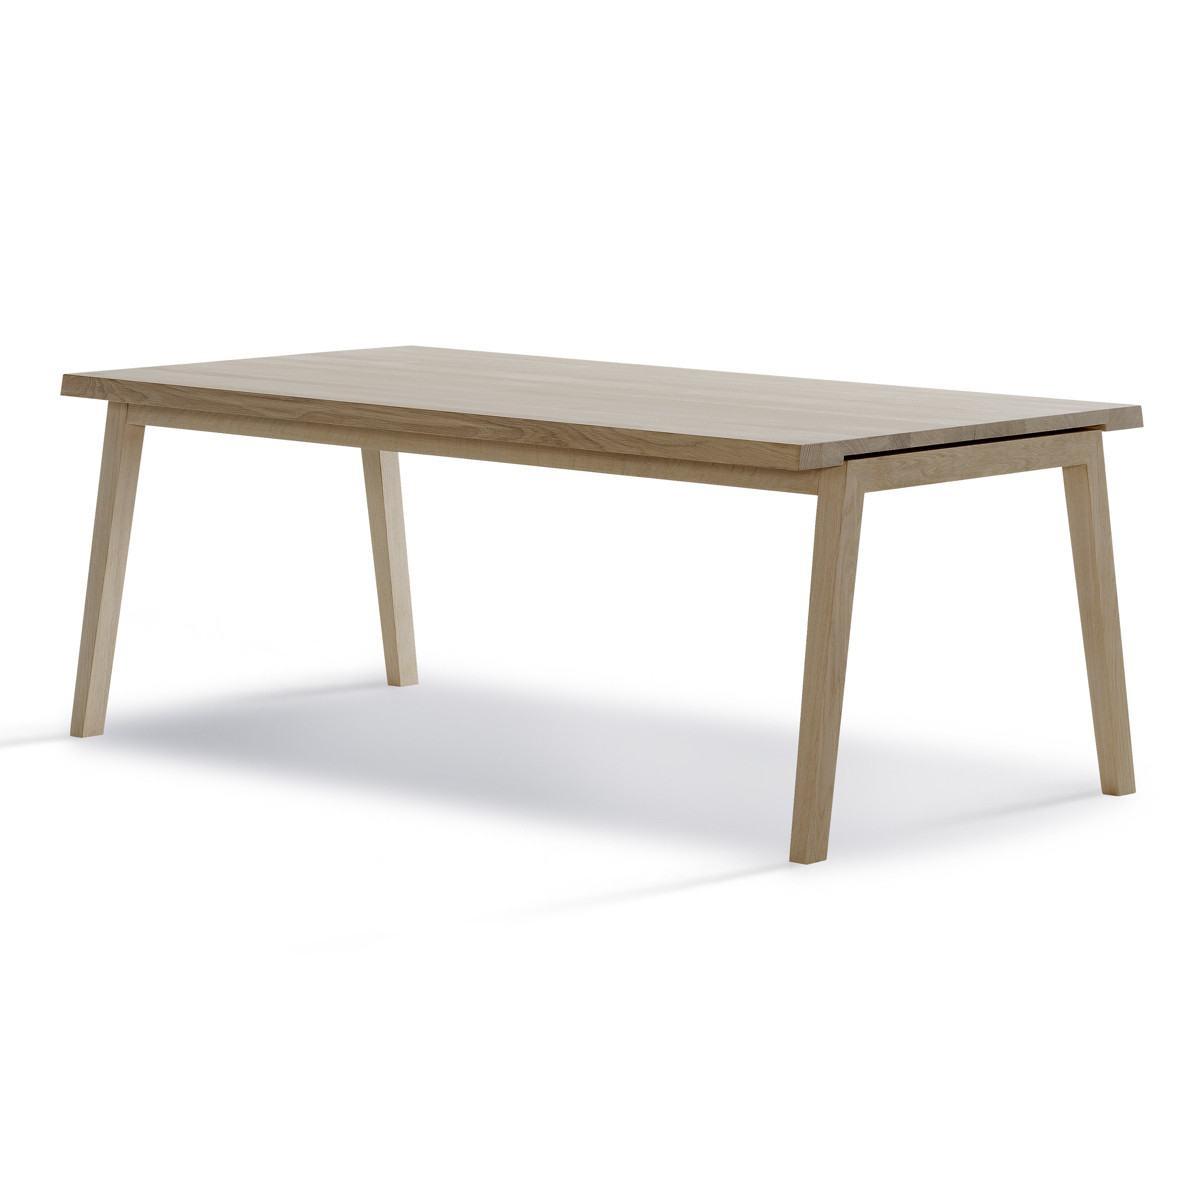 Carl Hansen SH900 Extend Dining Table